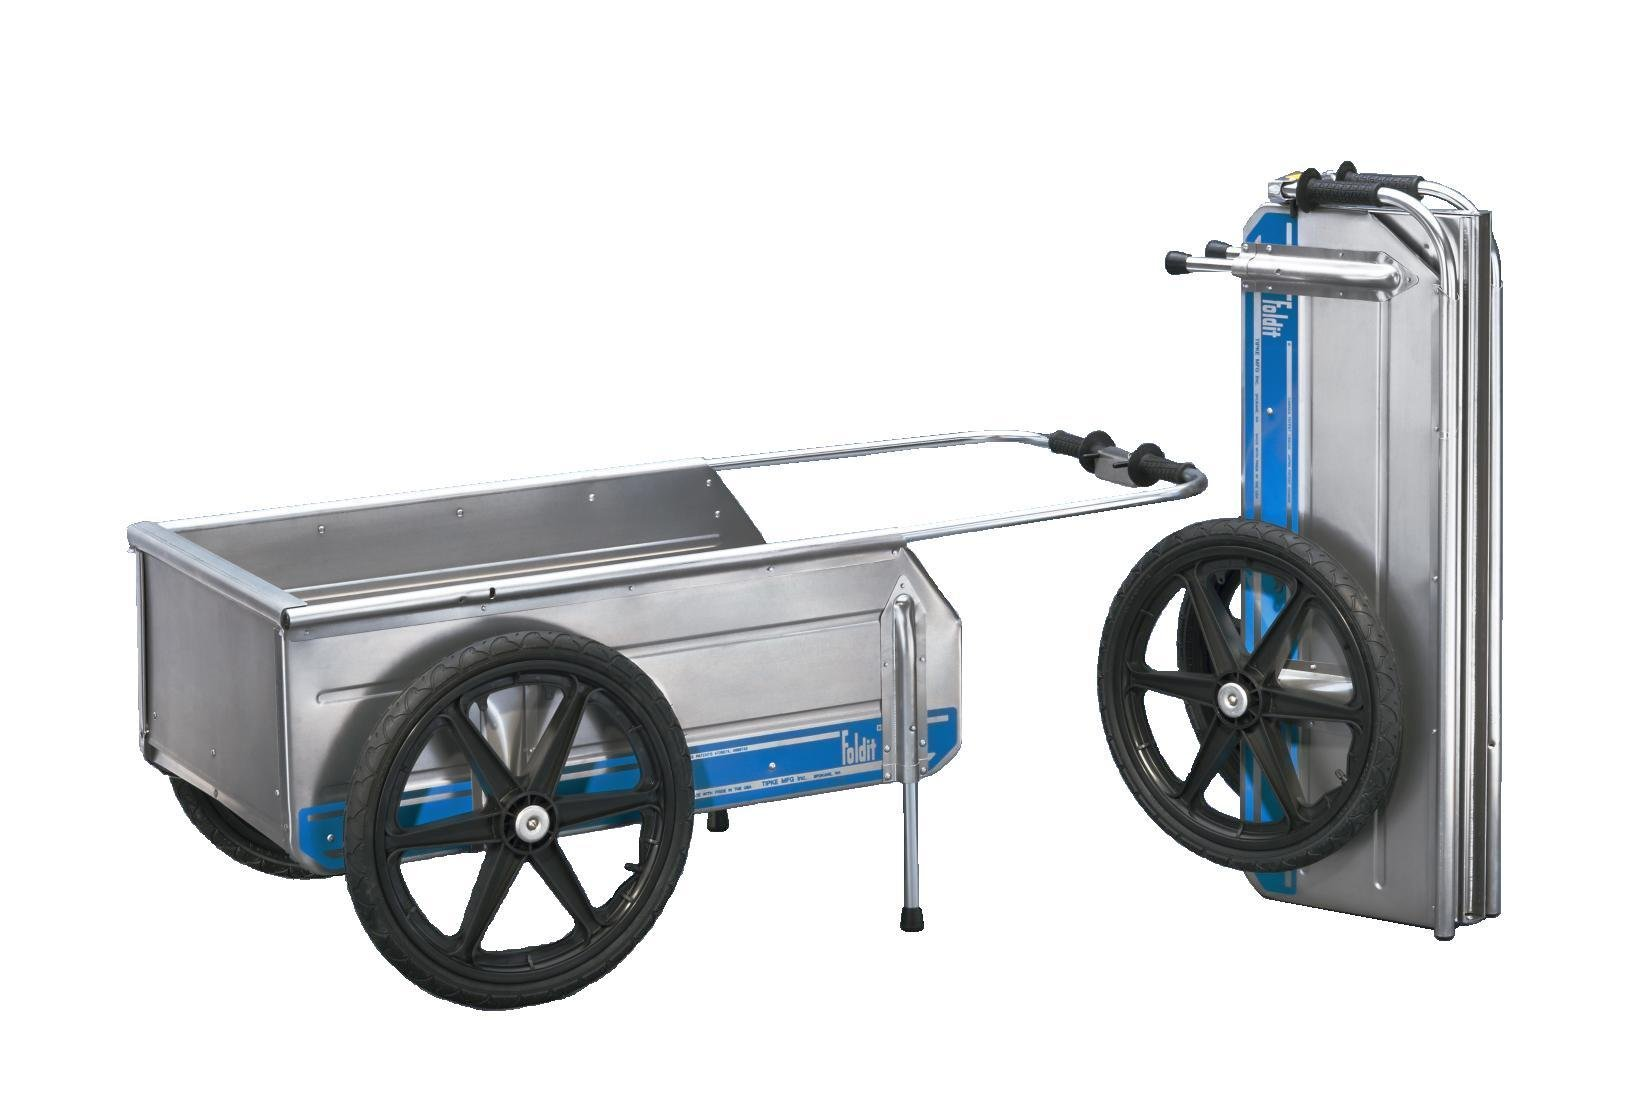 Tipke 2100 Marine Fold-It Utility Cart by Tipke Manufacturing